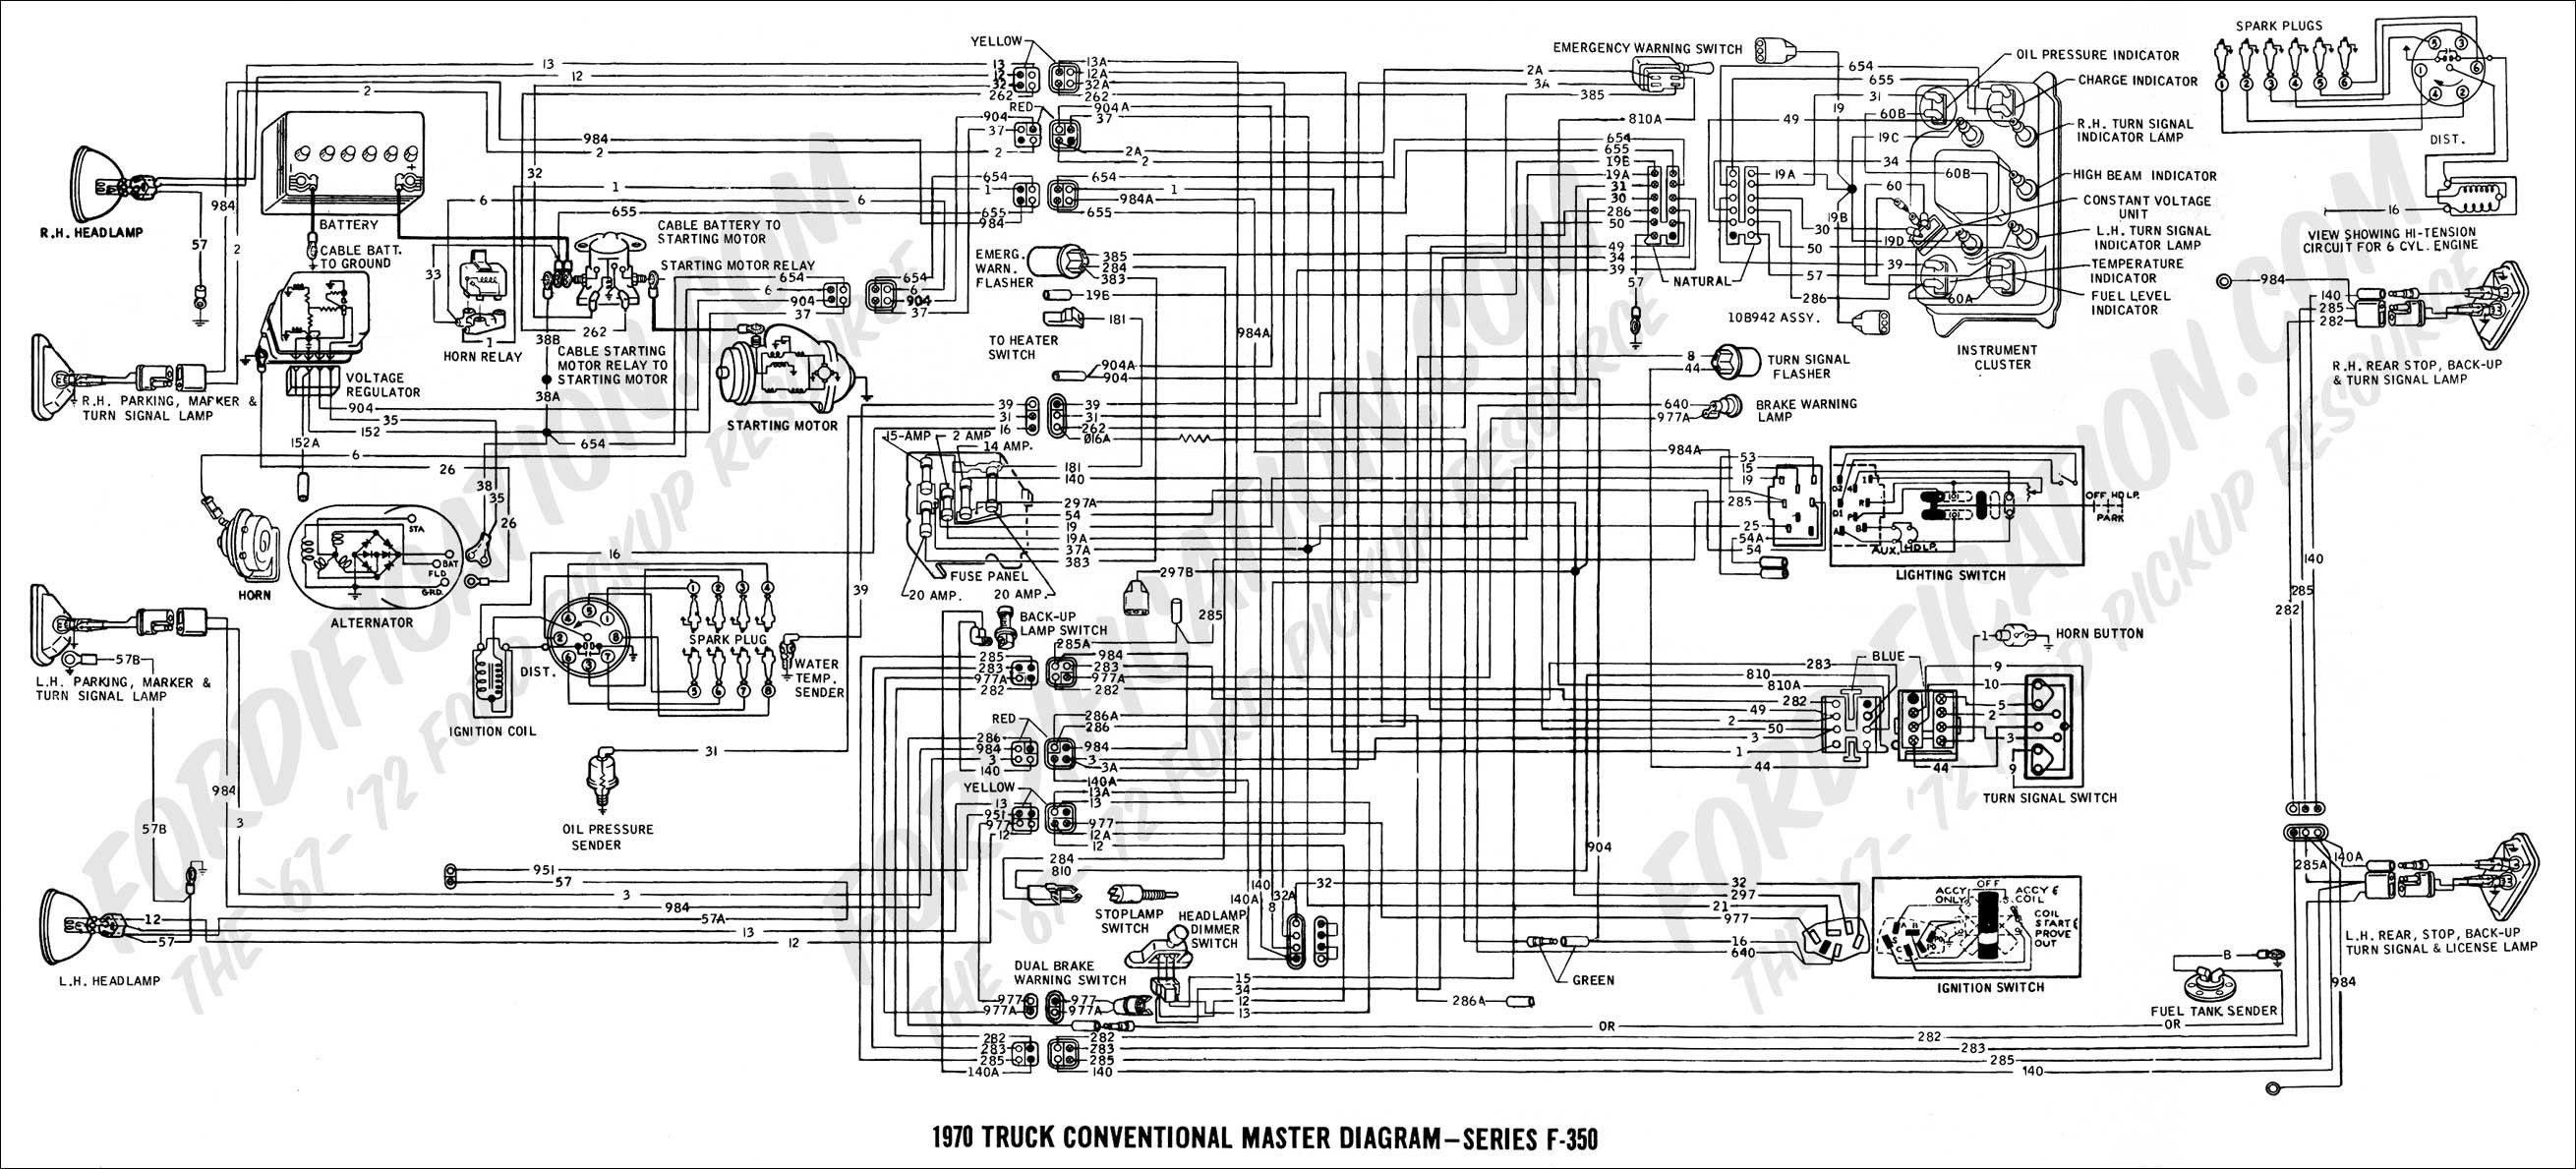 TM_6270] Ford Ranger Wiring Diagram Free Free DiagramPapxe Oupli Odga Mohammedshrine Librar Wiring 101